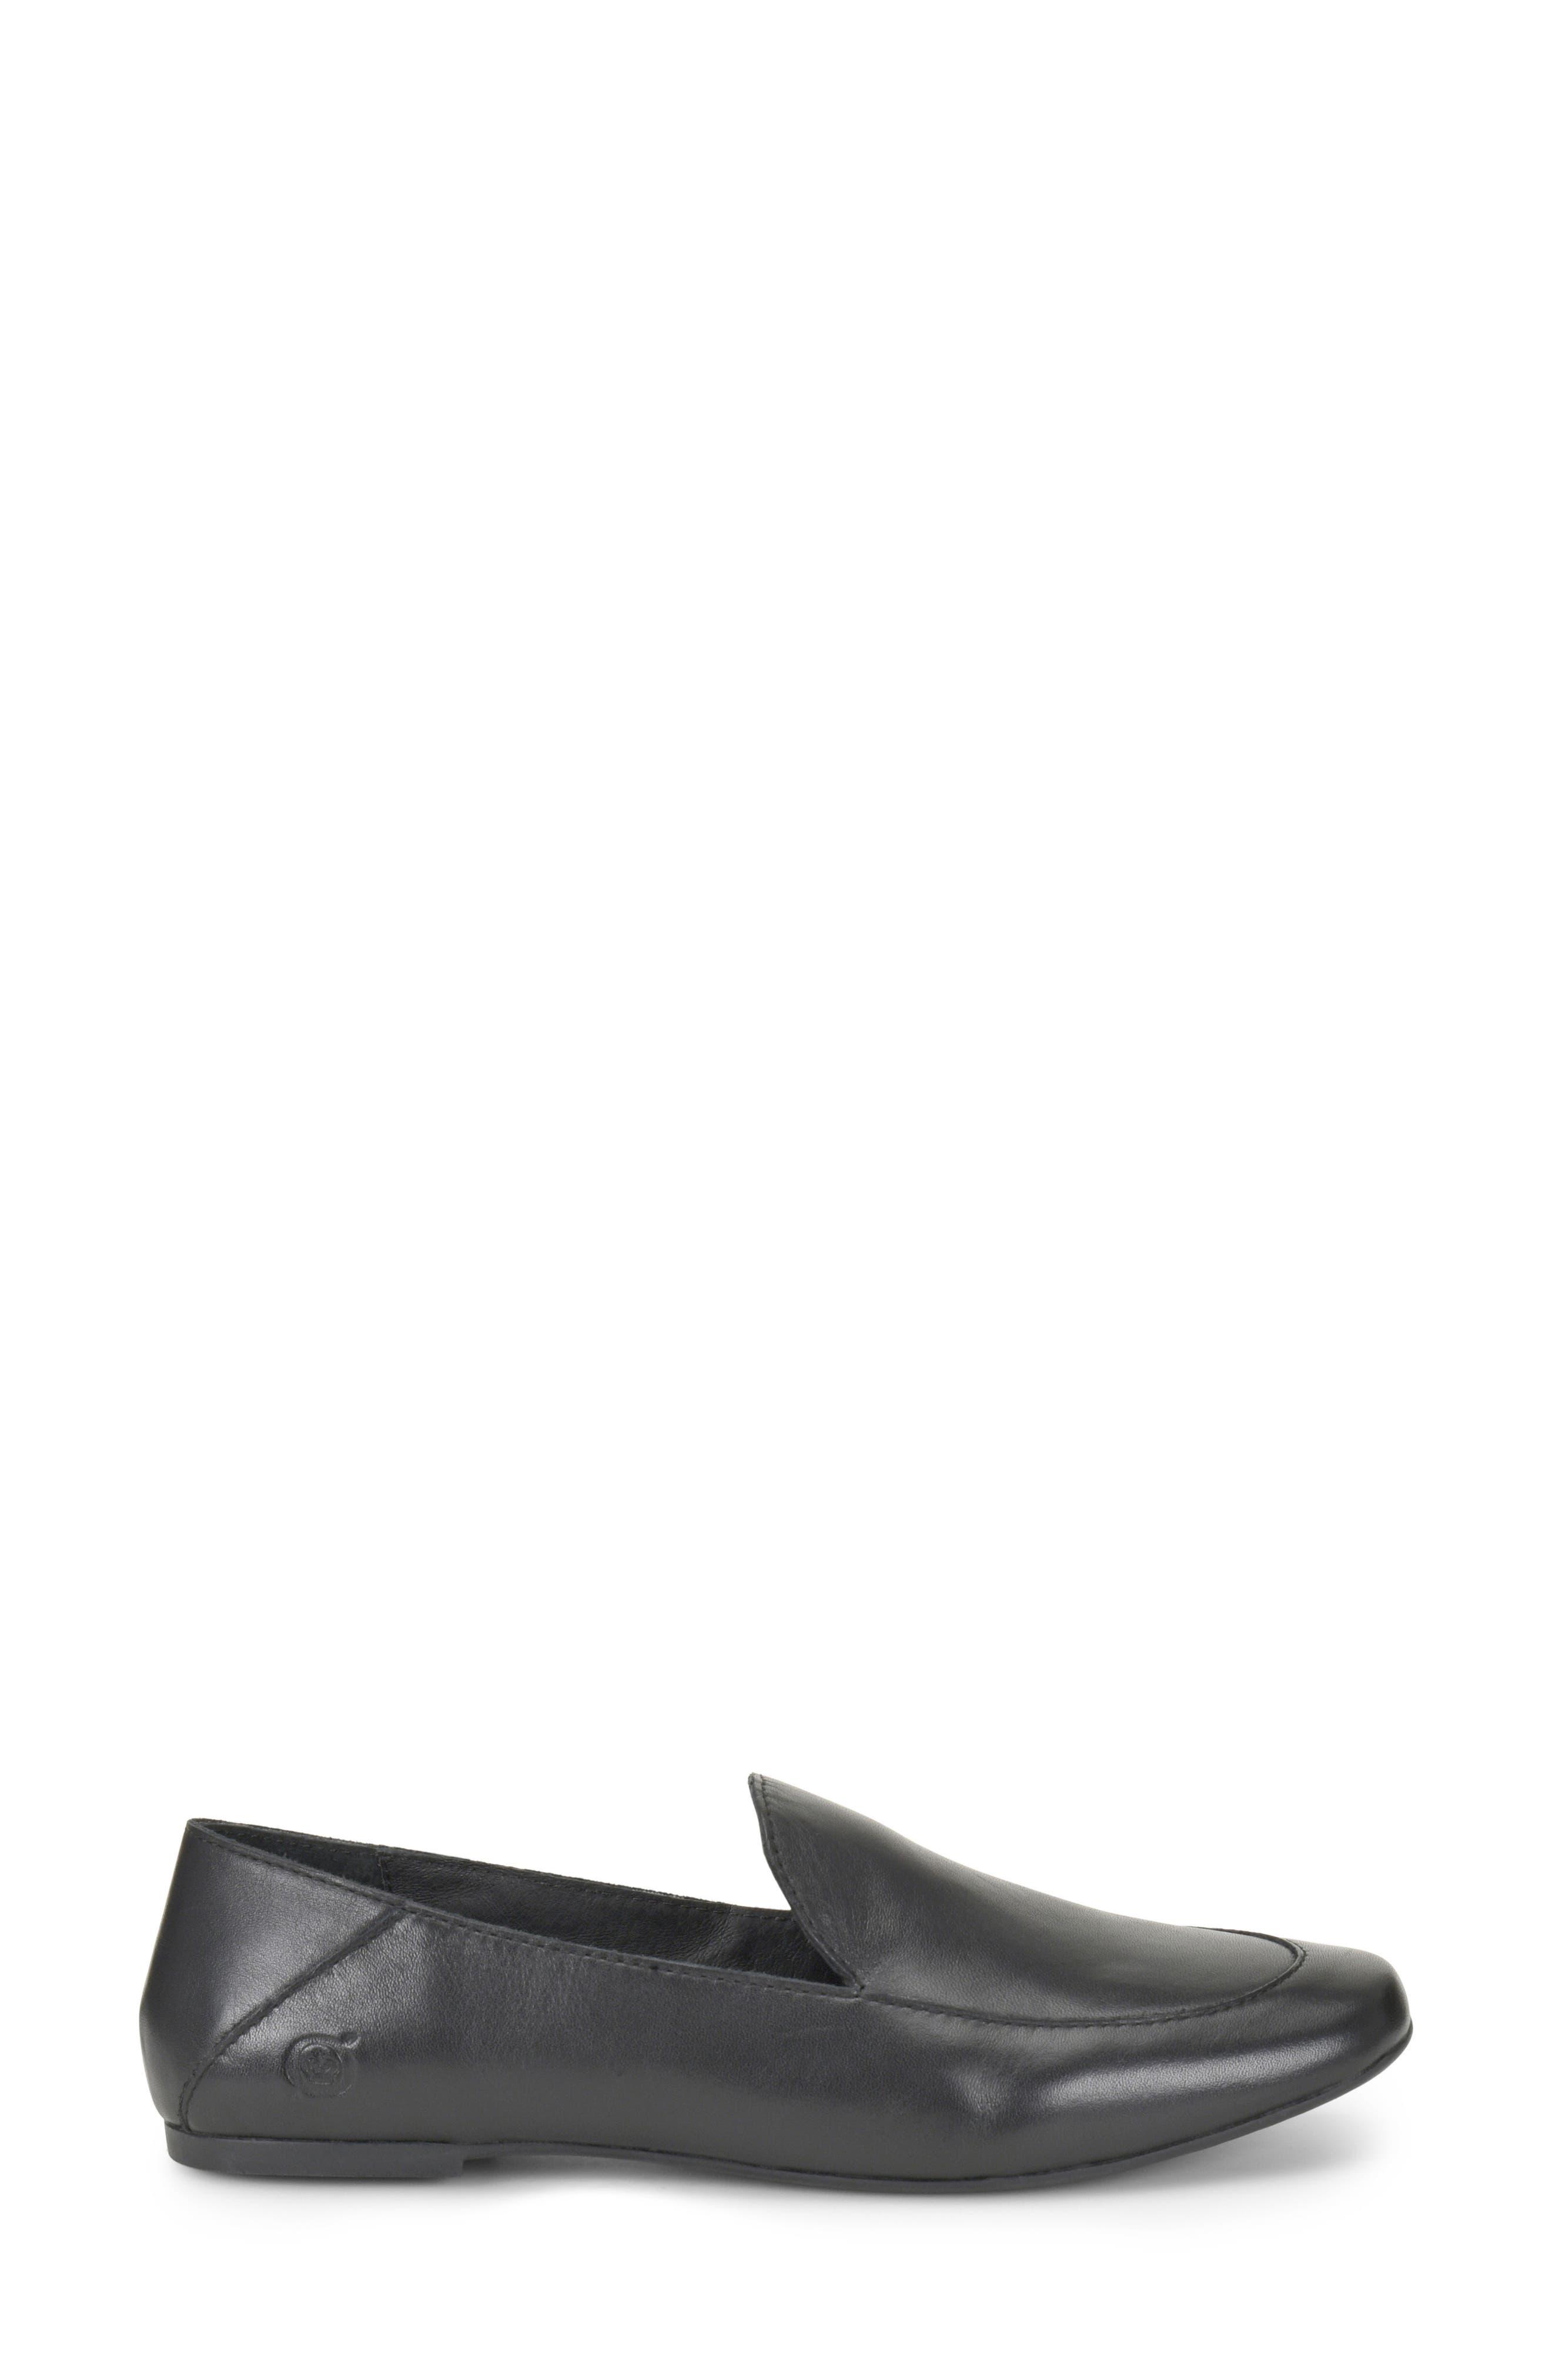 Carib Loafer,                             Alternate thumbnail 3, color,                             Black Leather